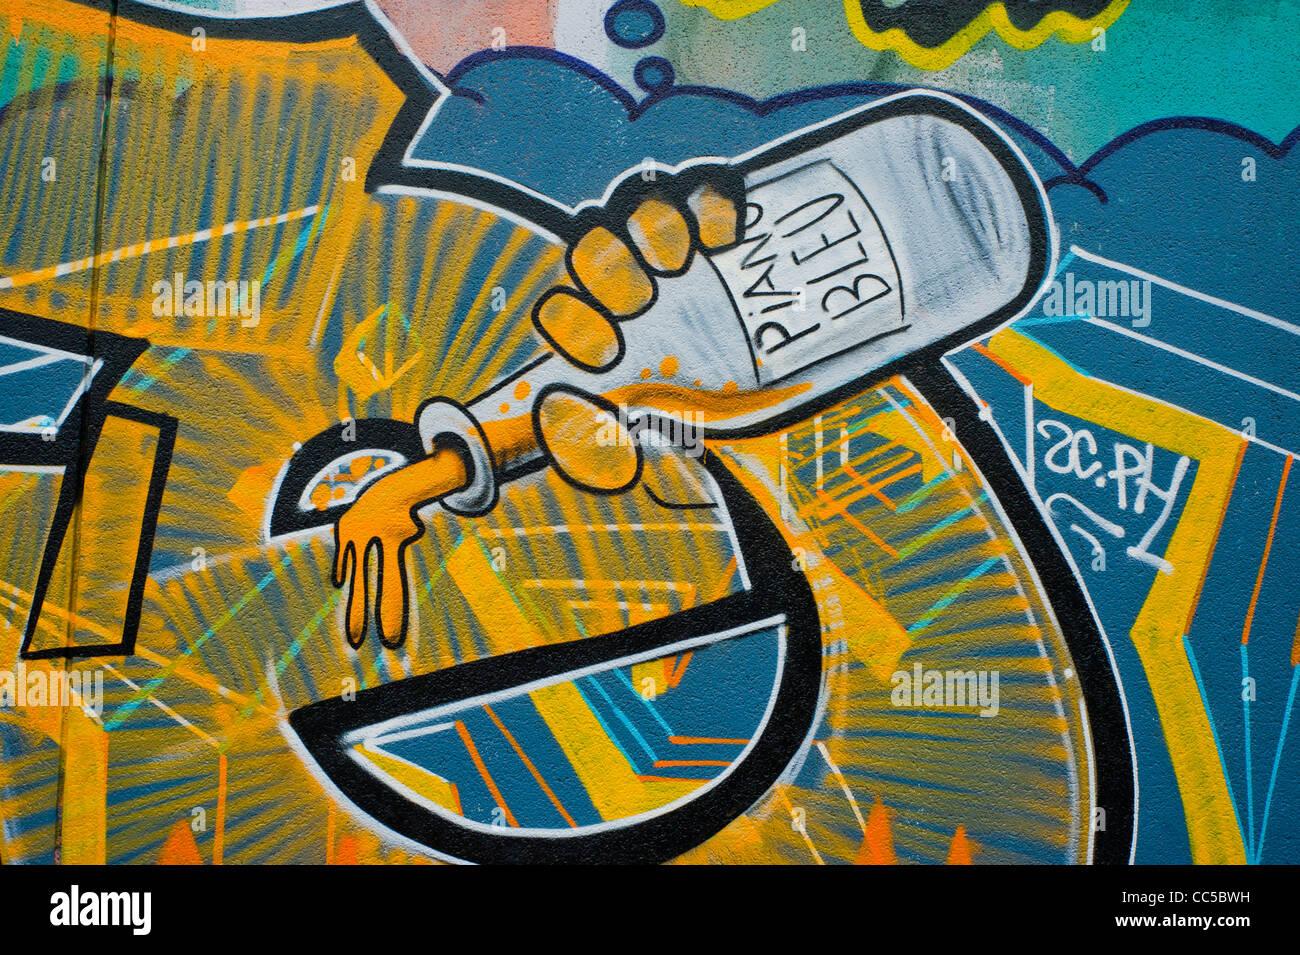 Paris, France, Graffiti Art Painting Wall, Drinking Alcohol Stock ...